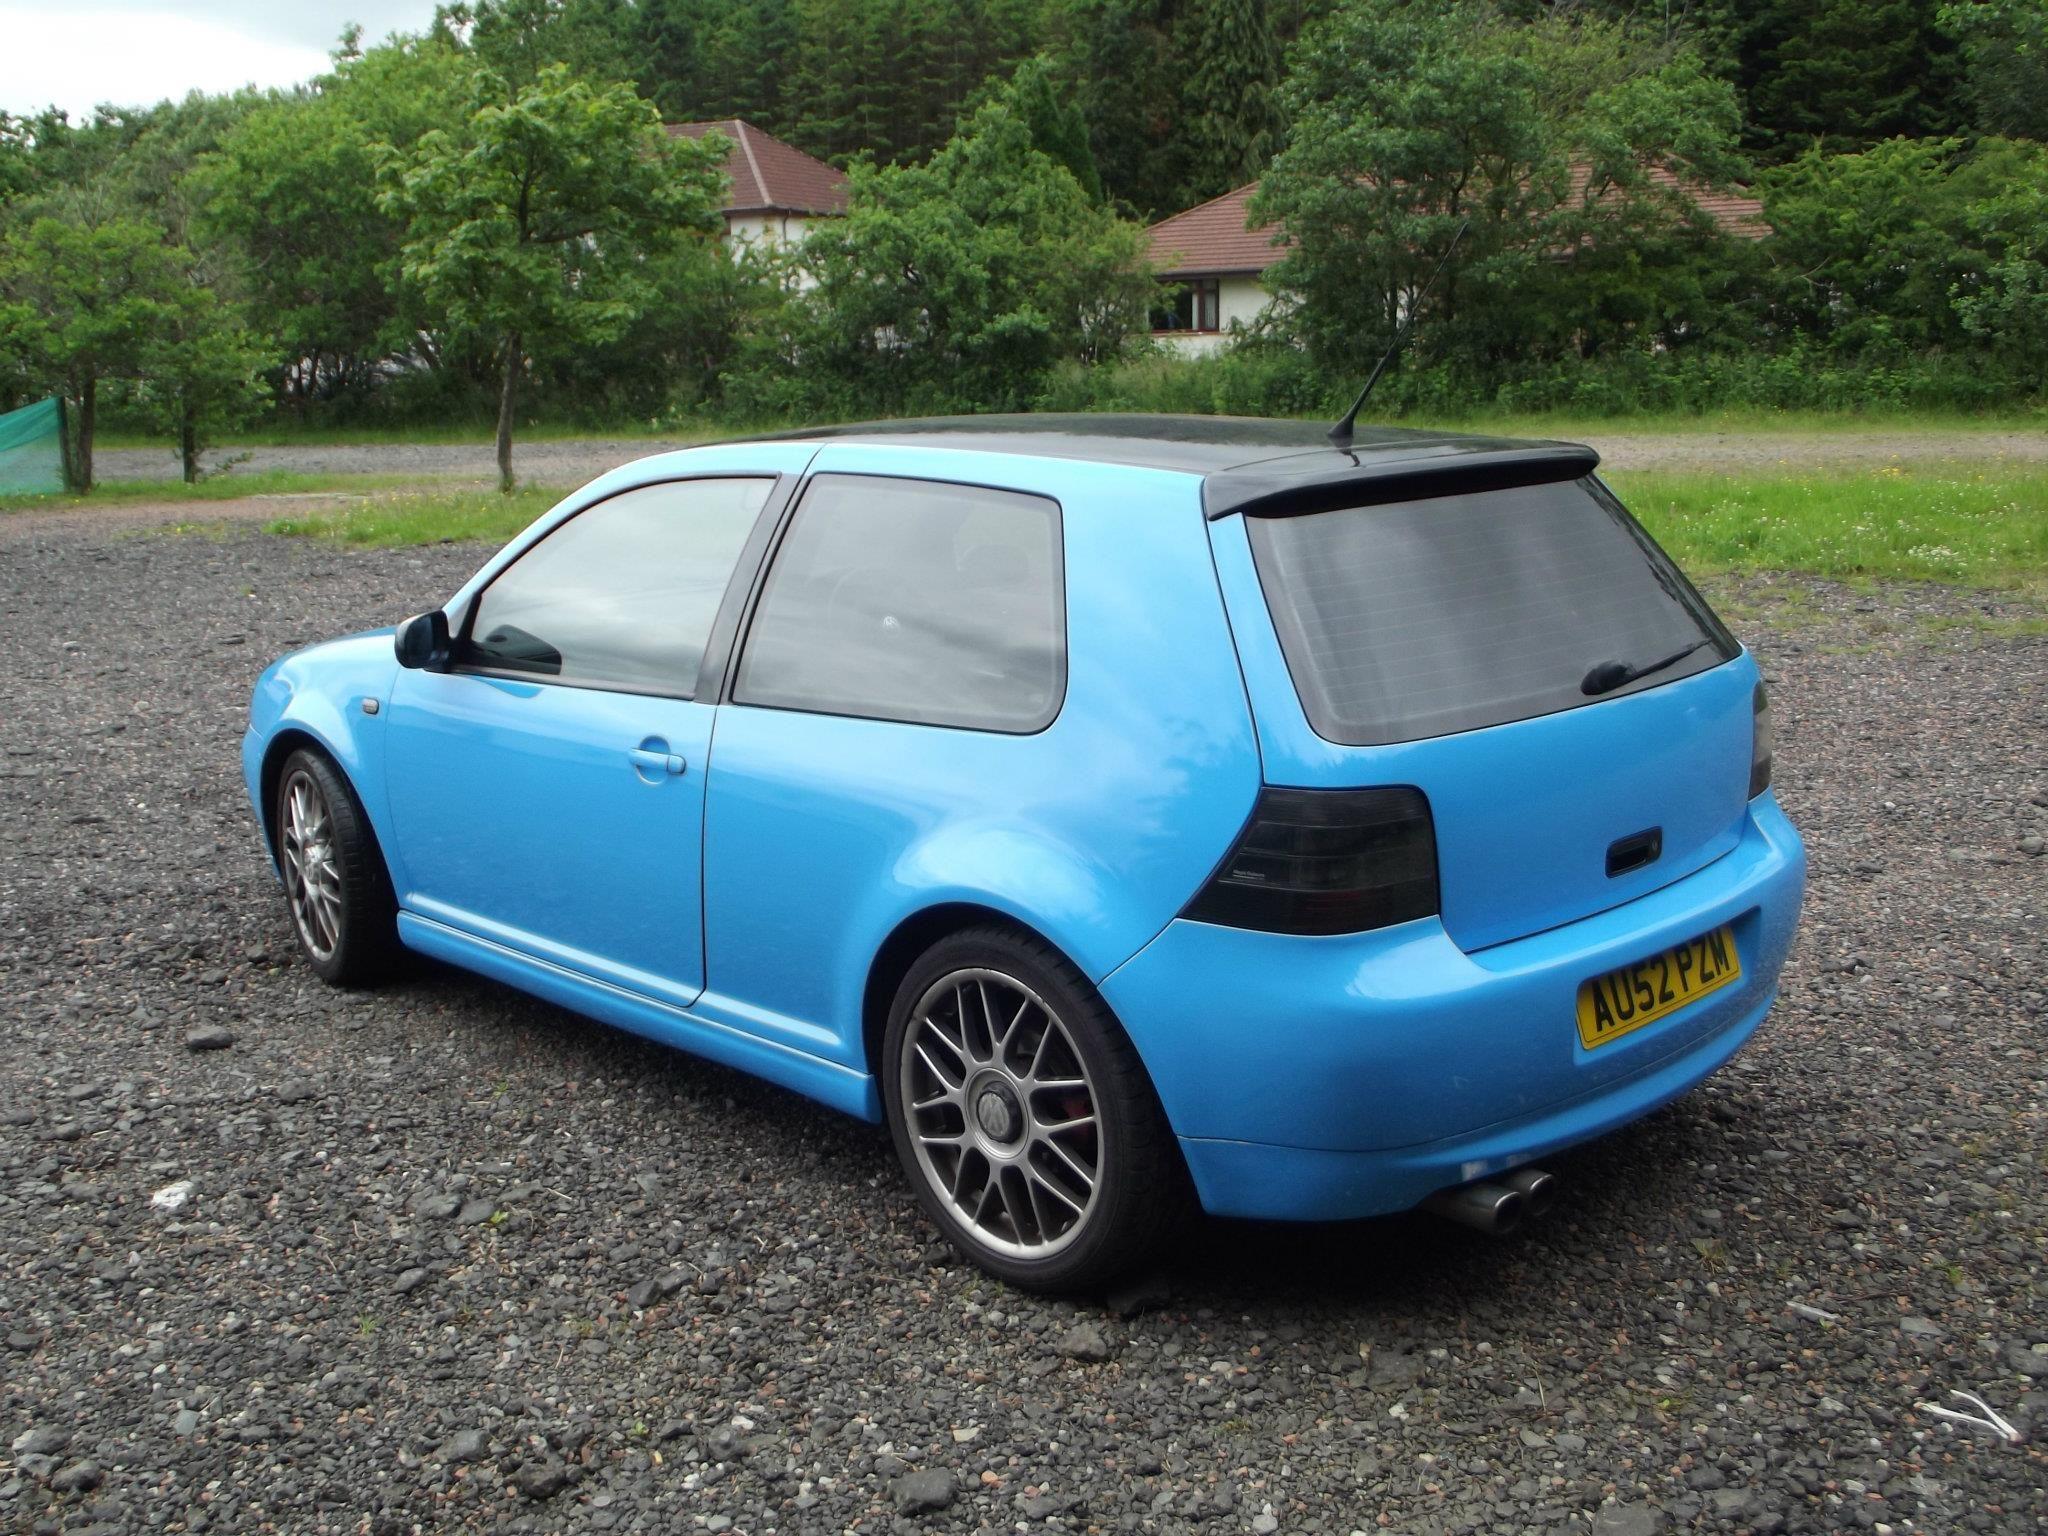 Mk4 Golf Wrapped Baby Blue Vw Mk4 Golf Baby Vw Golf Mk4